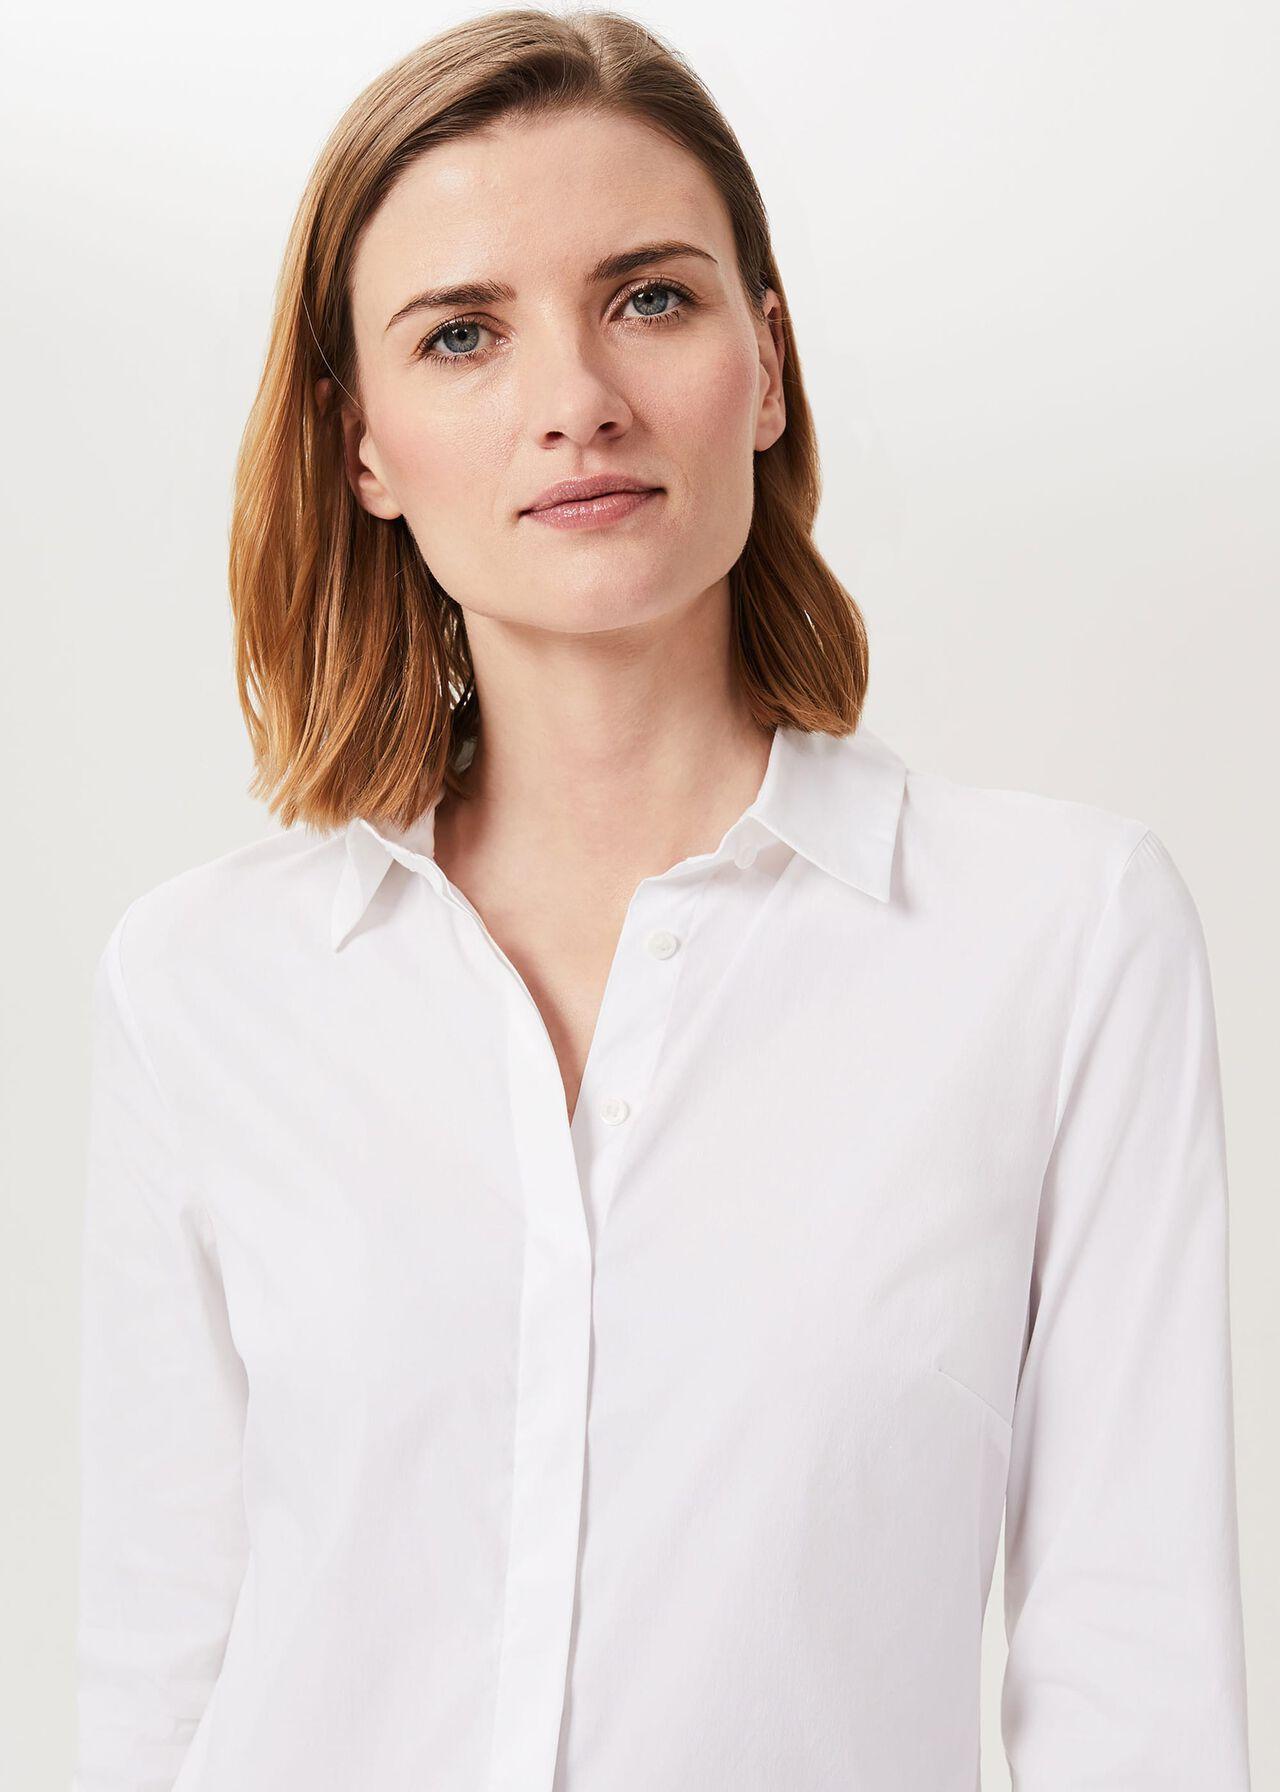 Victoria Cotton Blend Shirt, White, hi-res